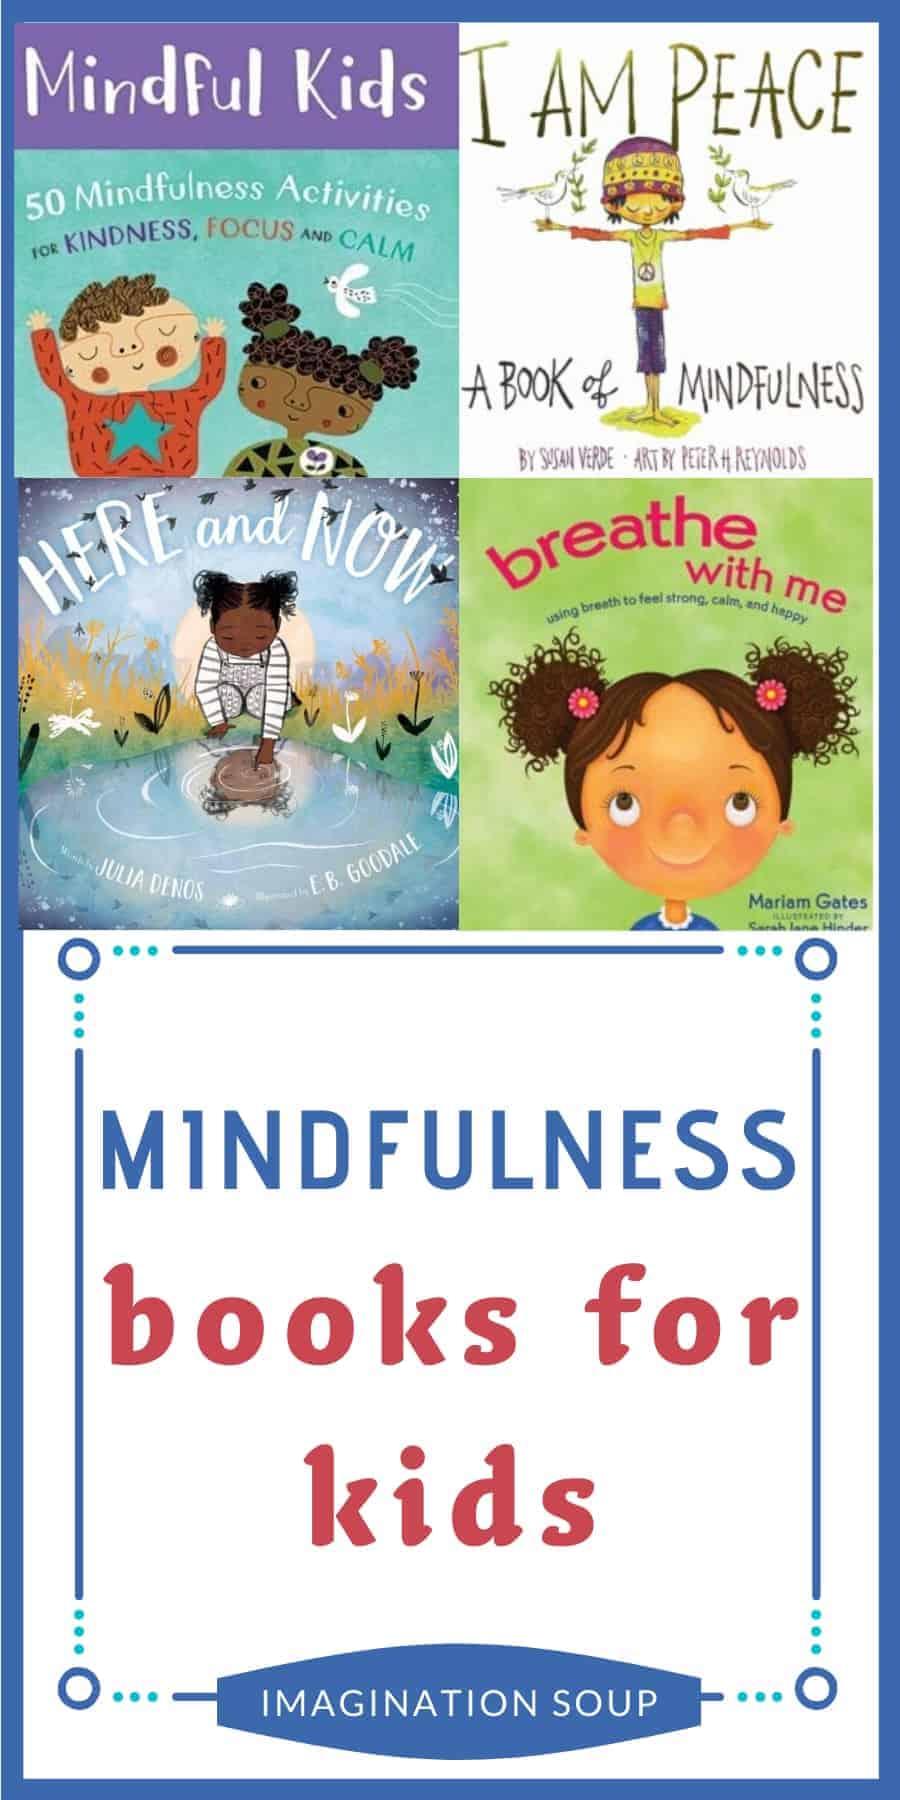 mindfulness children's books for kids